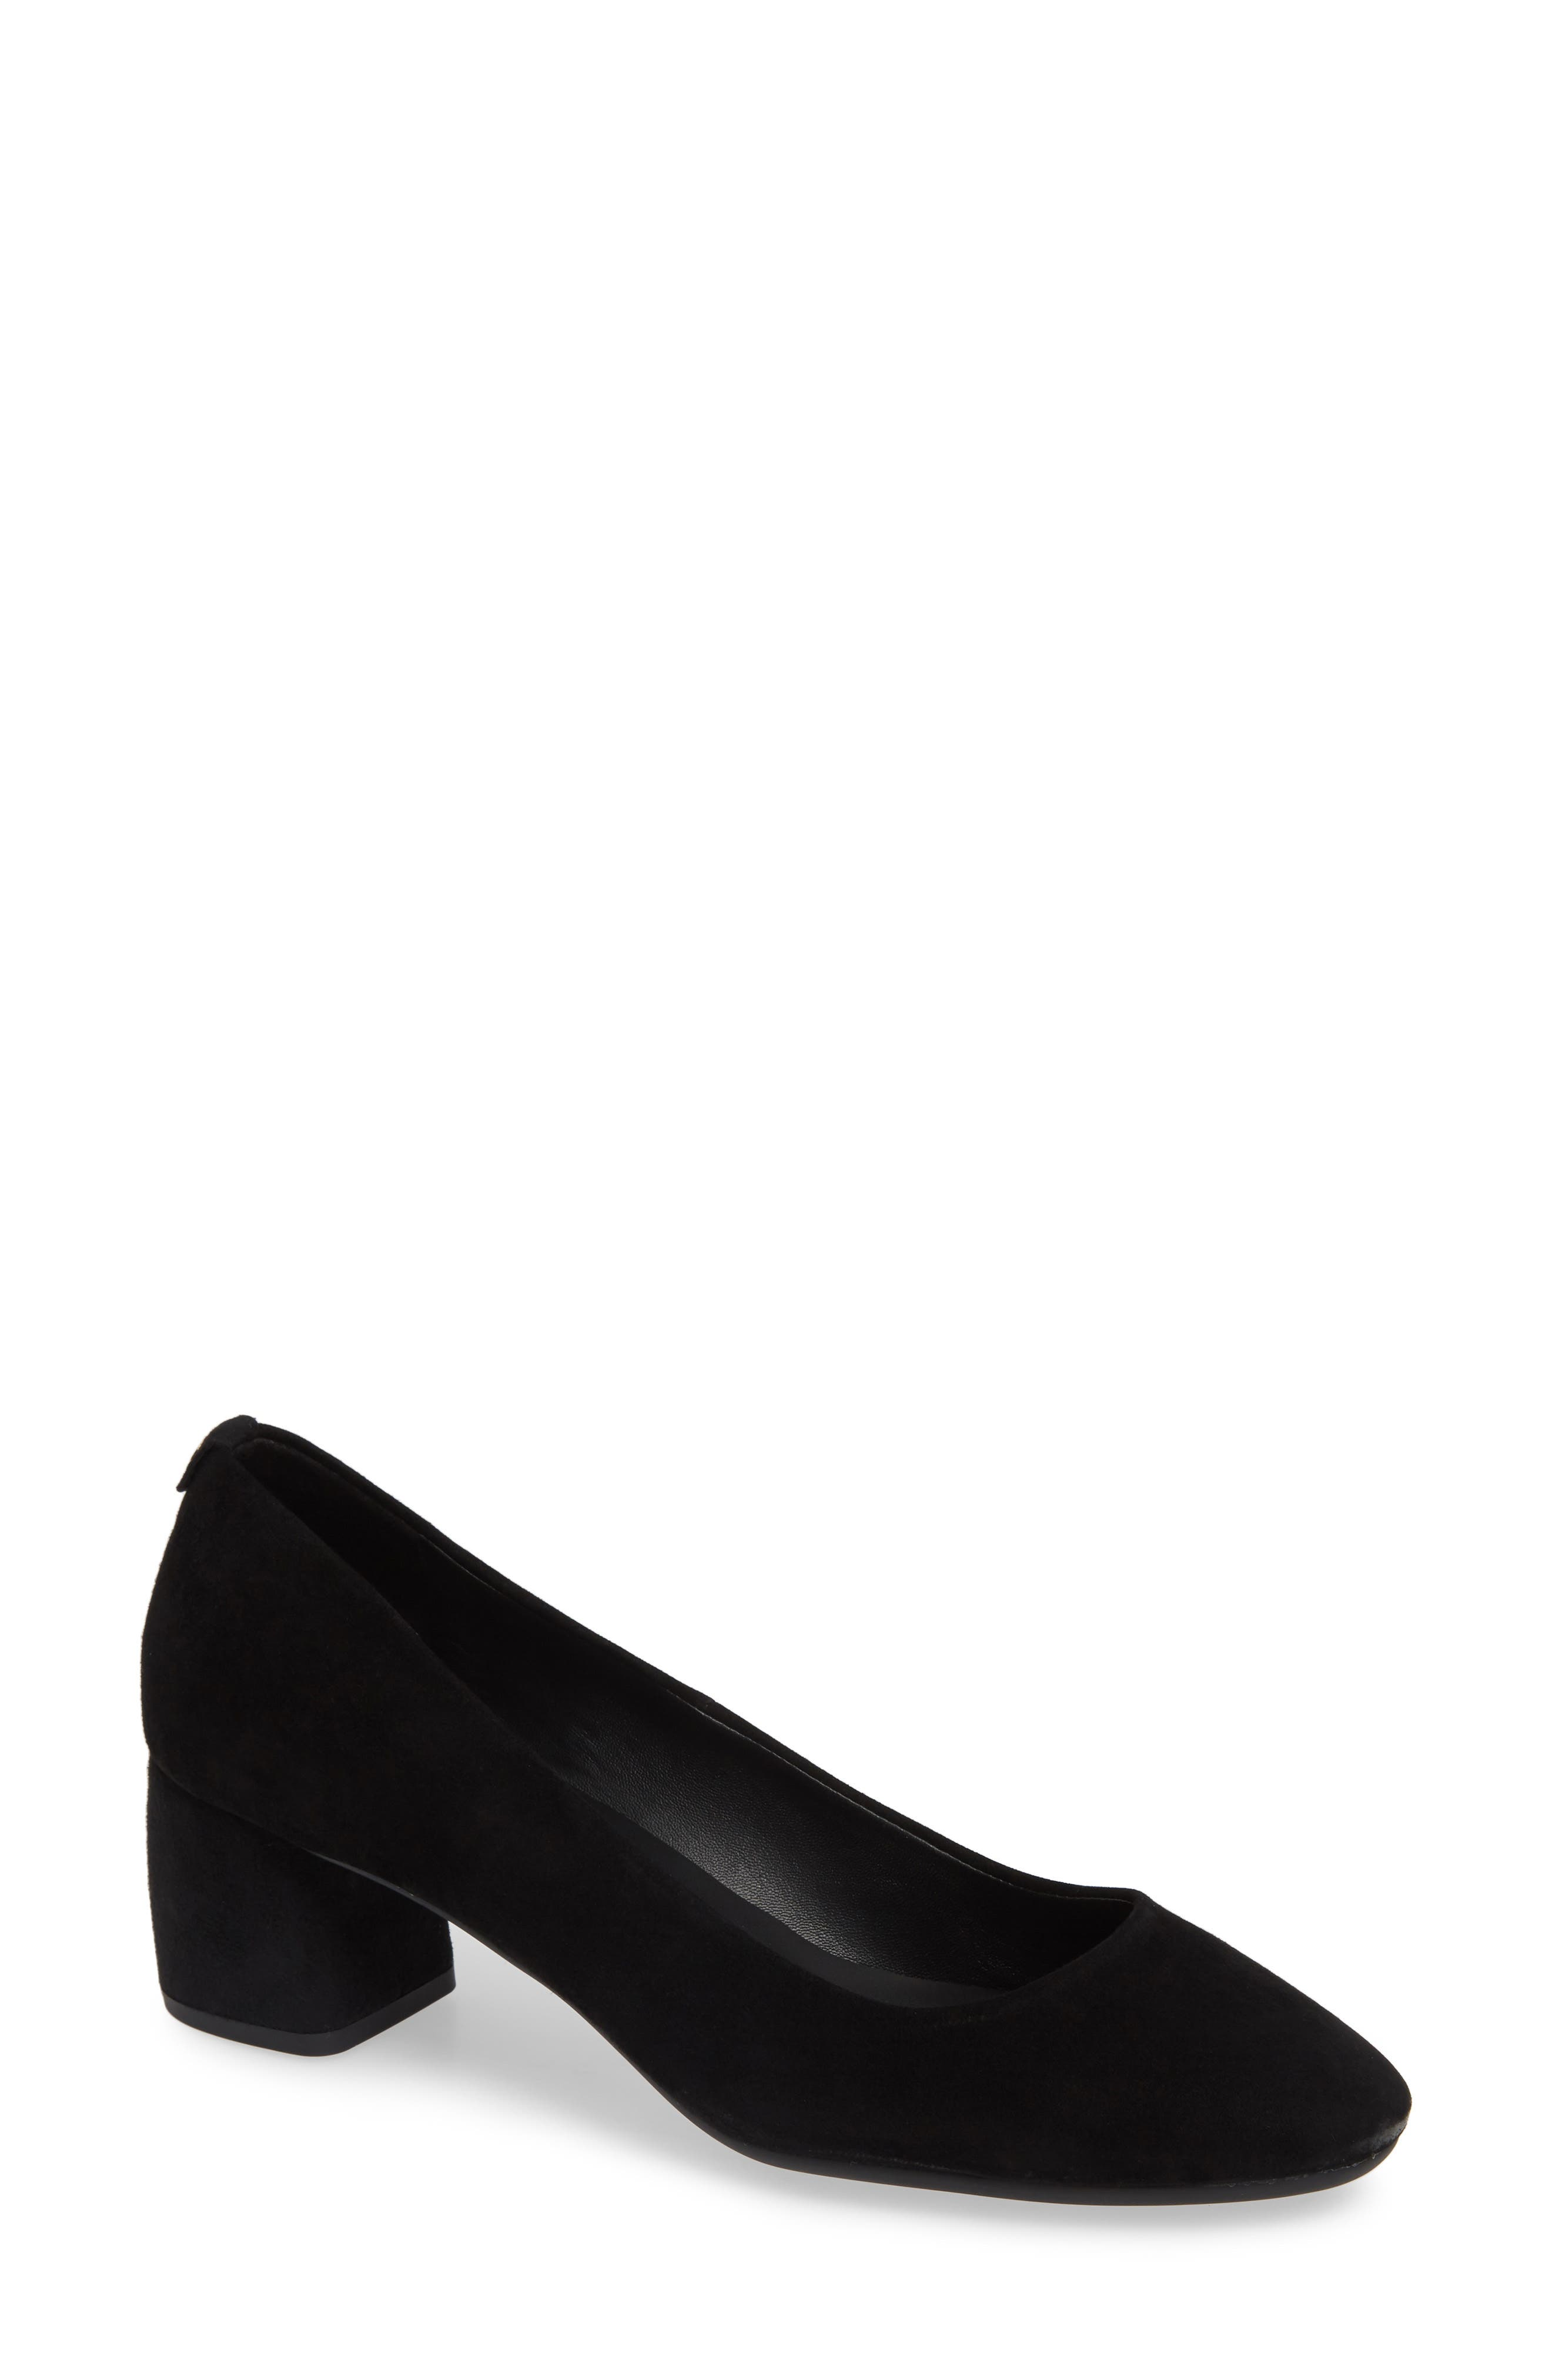 5ff9adf5f1 Kate Spade New York Beverly Pump, Black